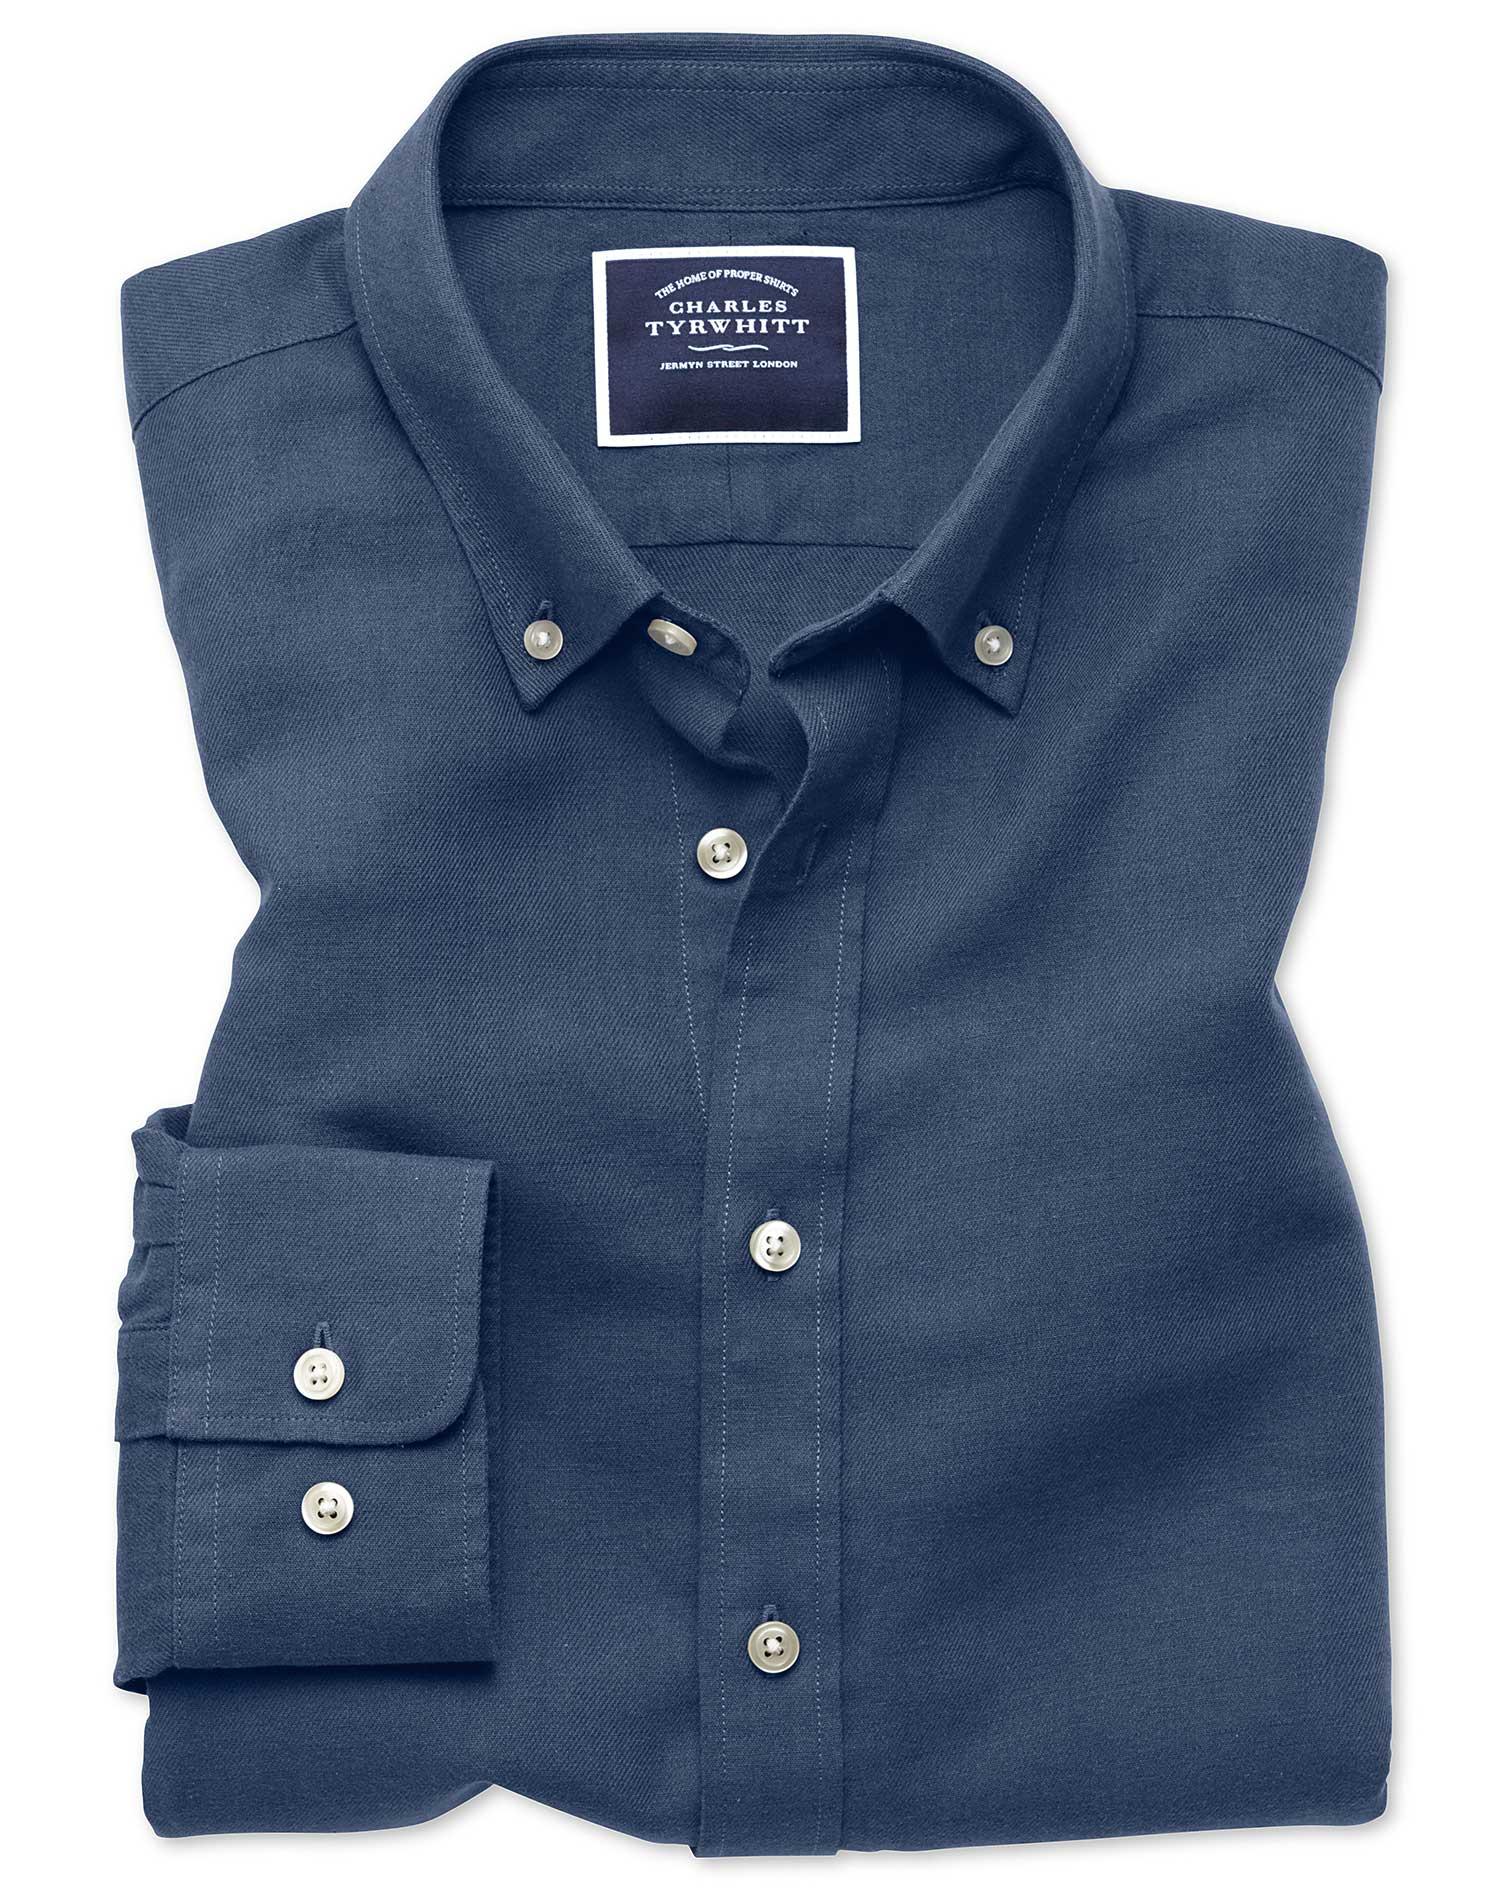 Classic Fit Dark Blue Cotton Linen Twill Shirt Single Cuff Size Large by Charles Tyrwhitt